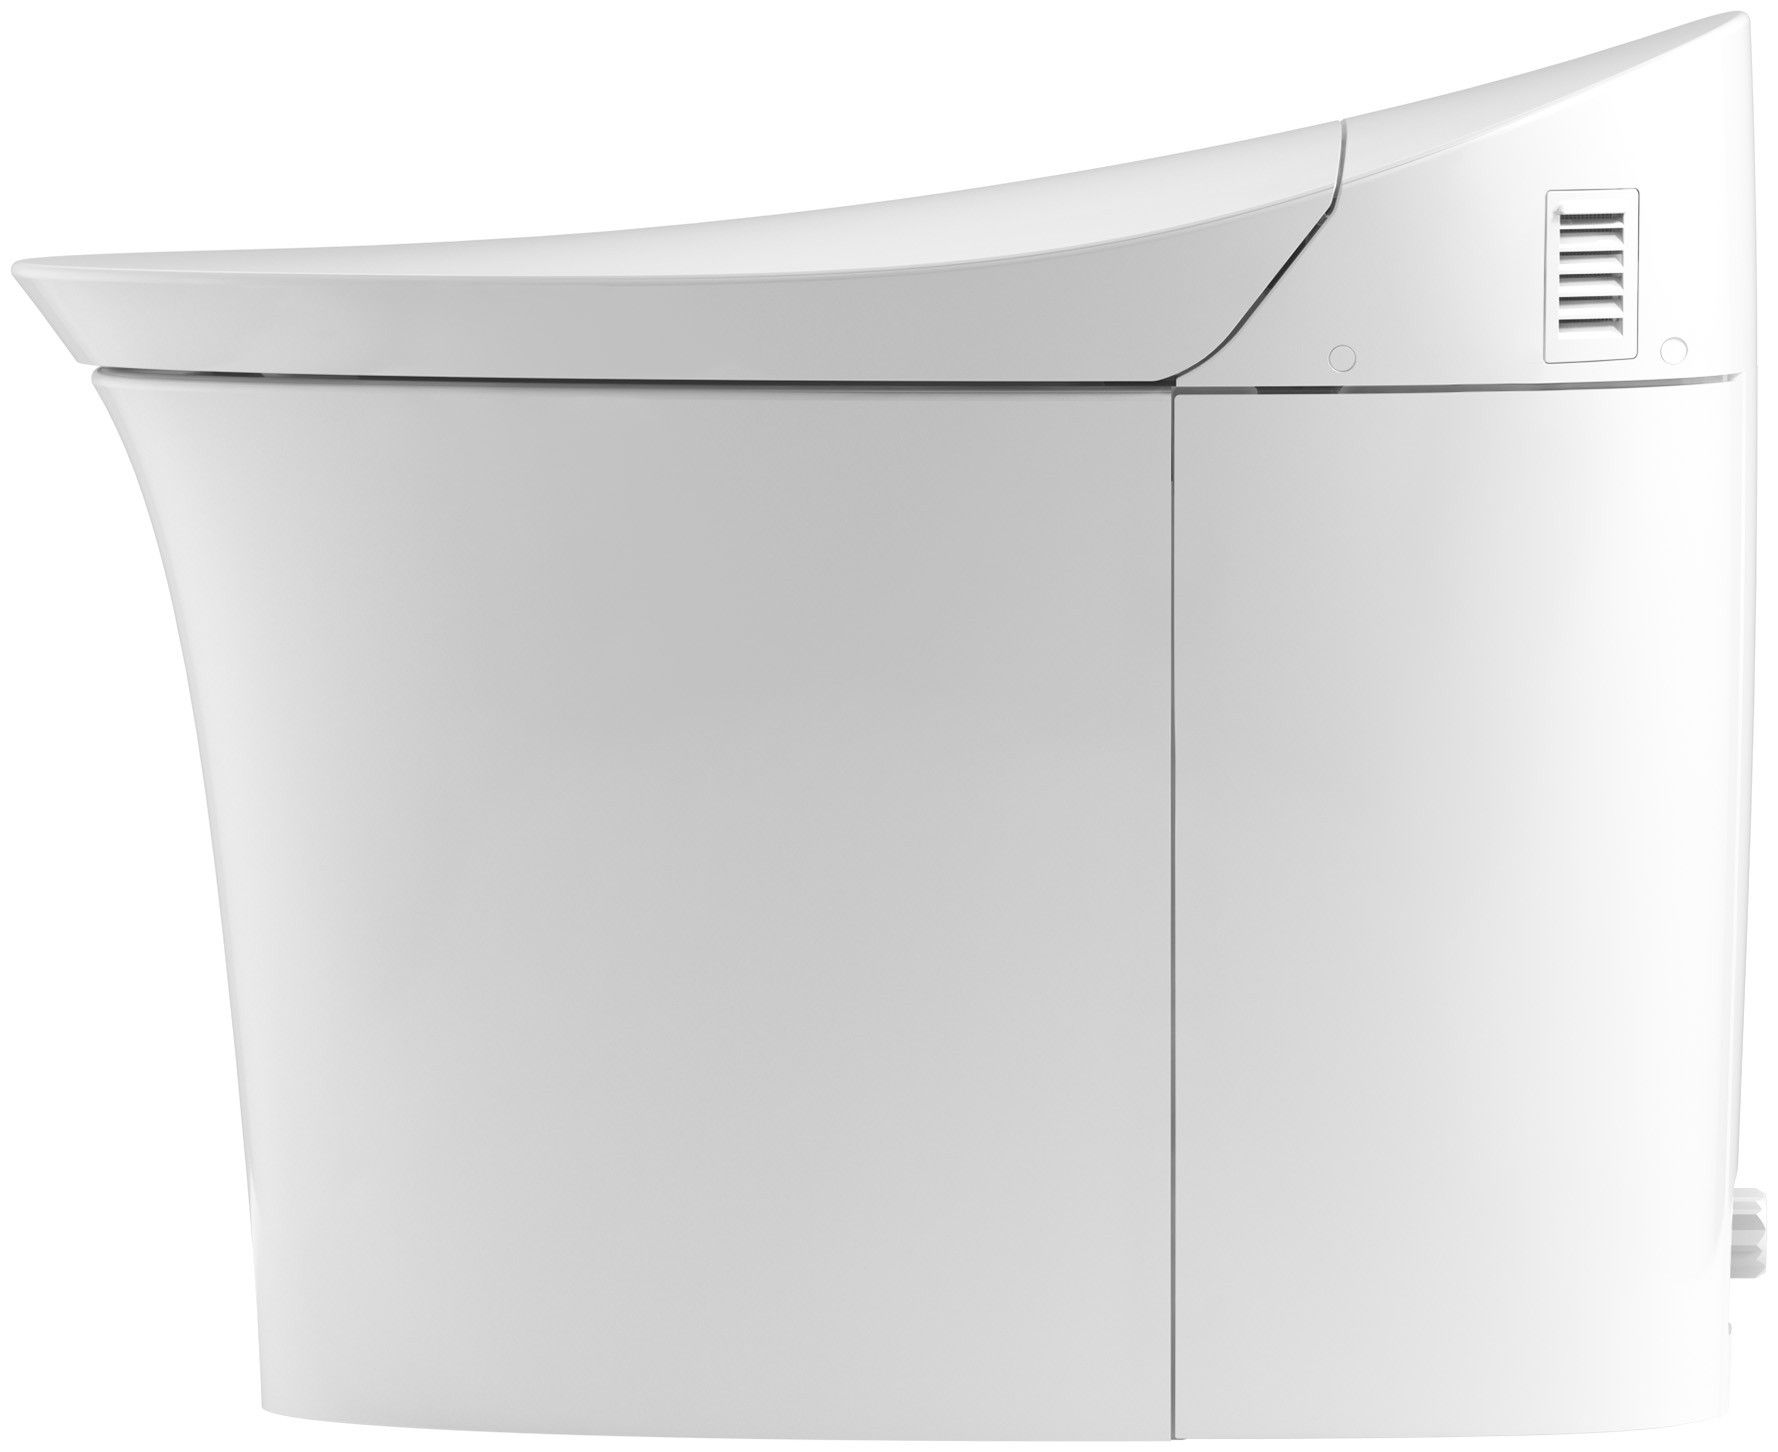 Kohler Veil K 5401 Pa 0 Comfort Height Intelligent Skirted One Piece Elongated Integrated Bidet Toilet Bidet Kohler Veil Bidet Toilet